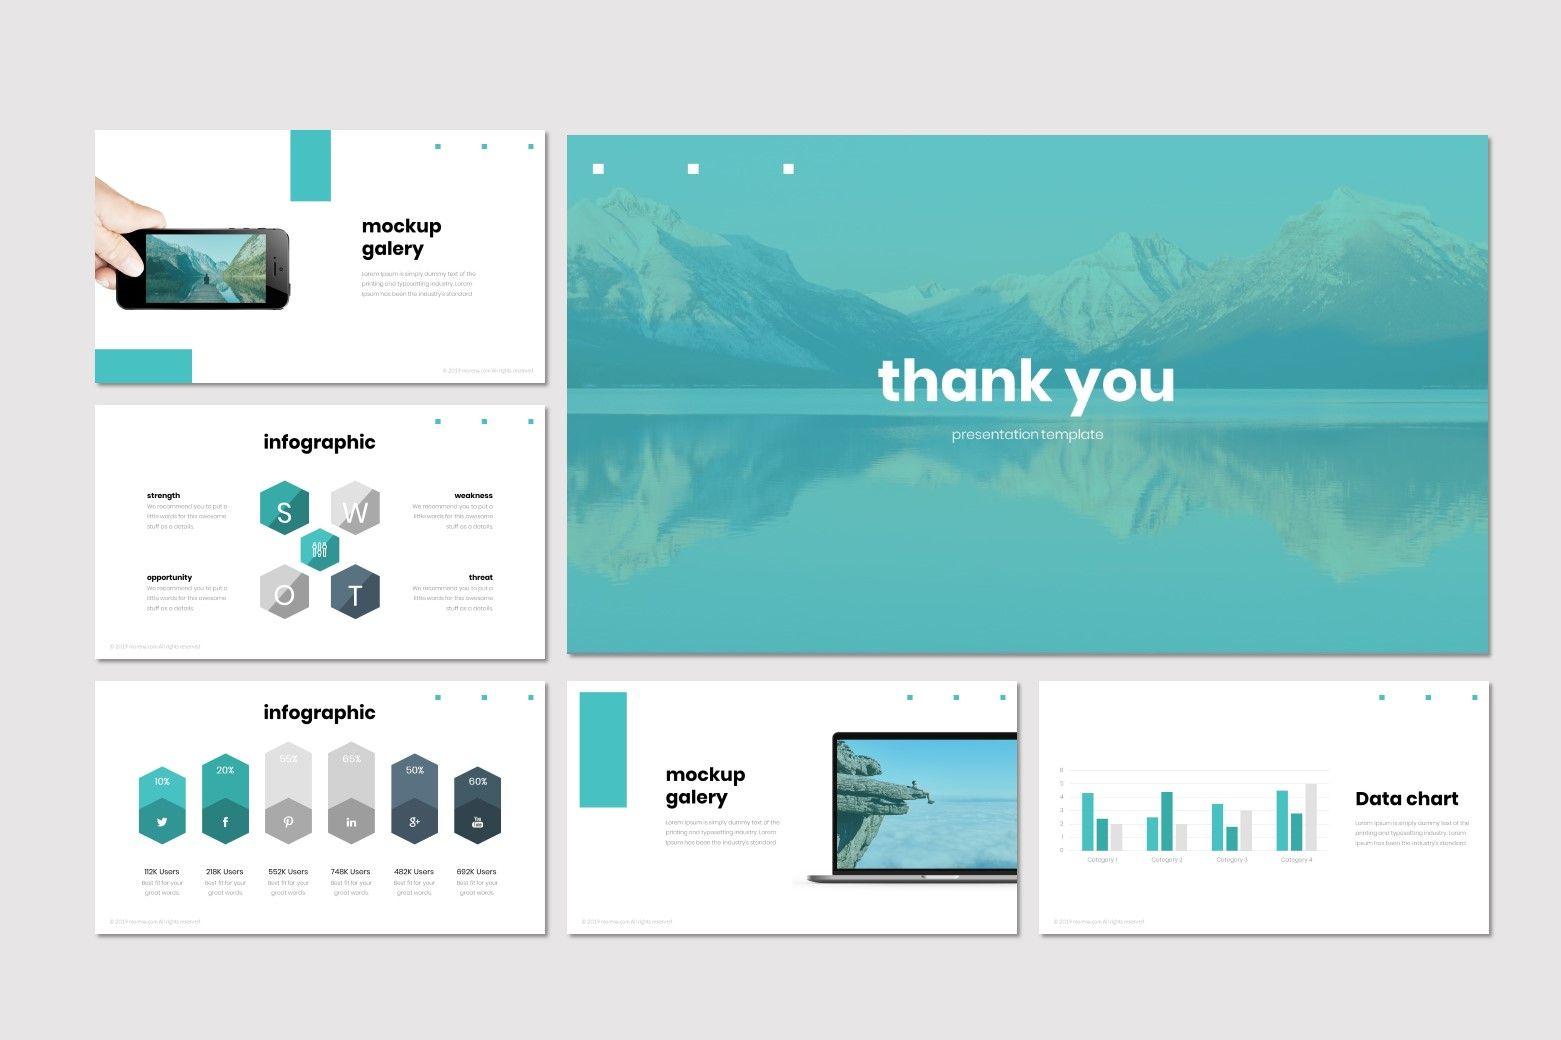 Moorena - PowerPoint Template, Slide 5, 07261, Presentation Templates — PoweredTemplate.com